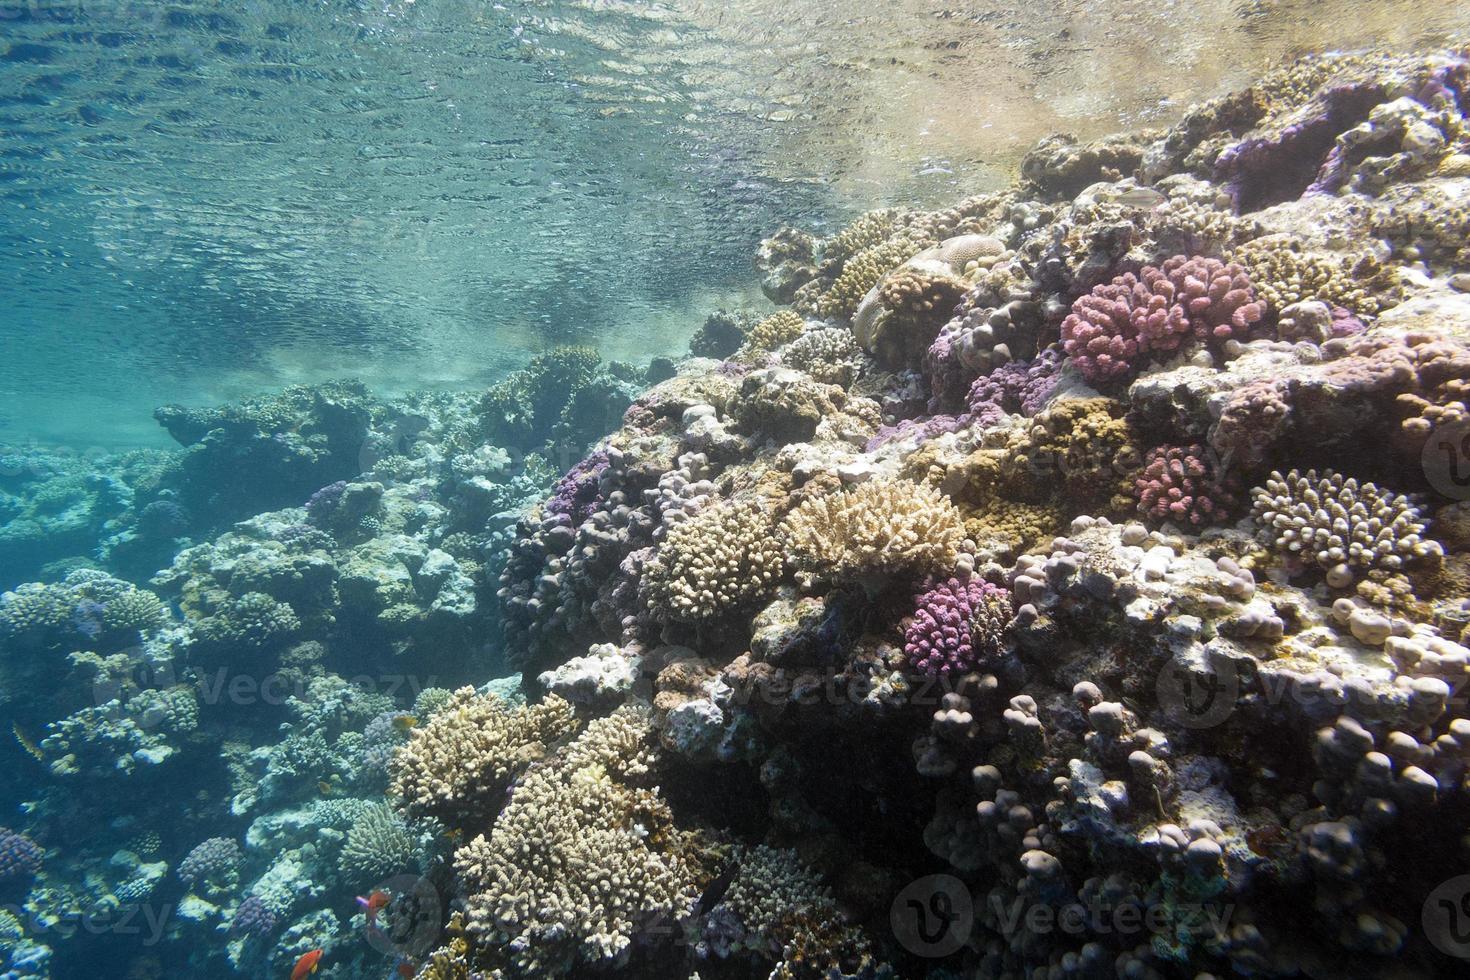 arrecife de coral bajo la superficie del agua en el mar tropical foto